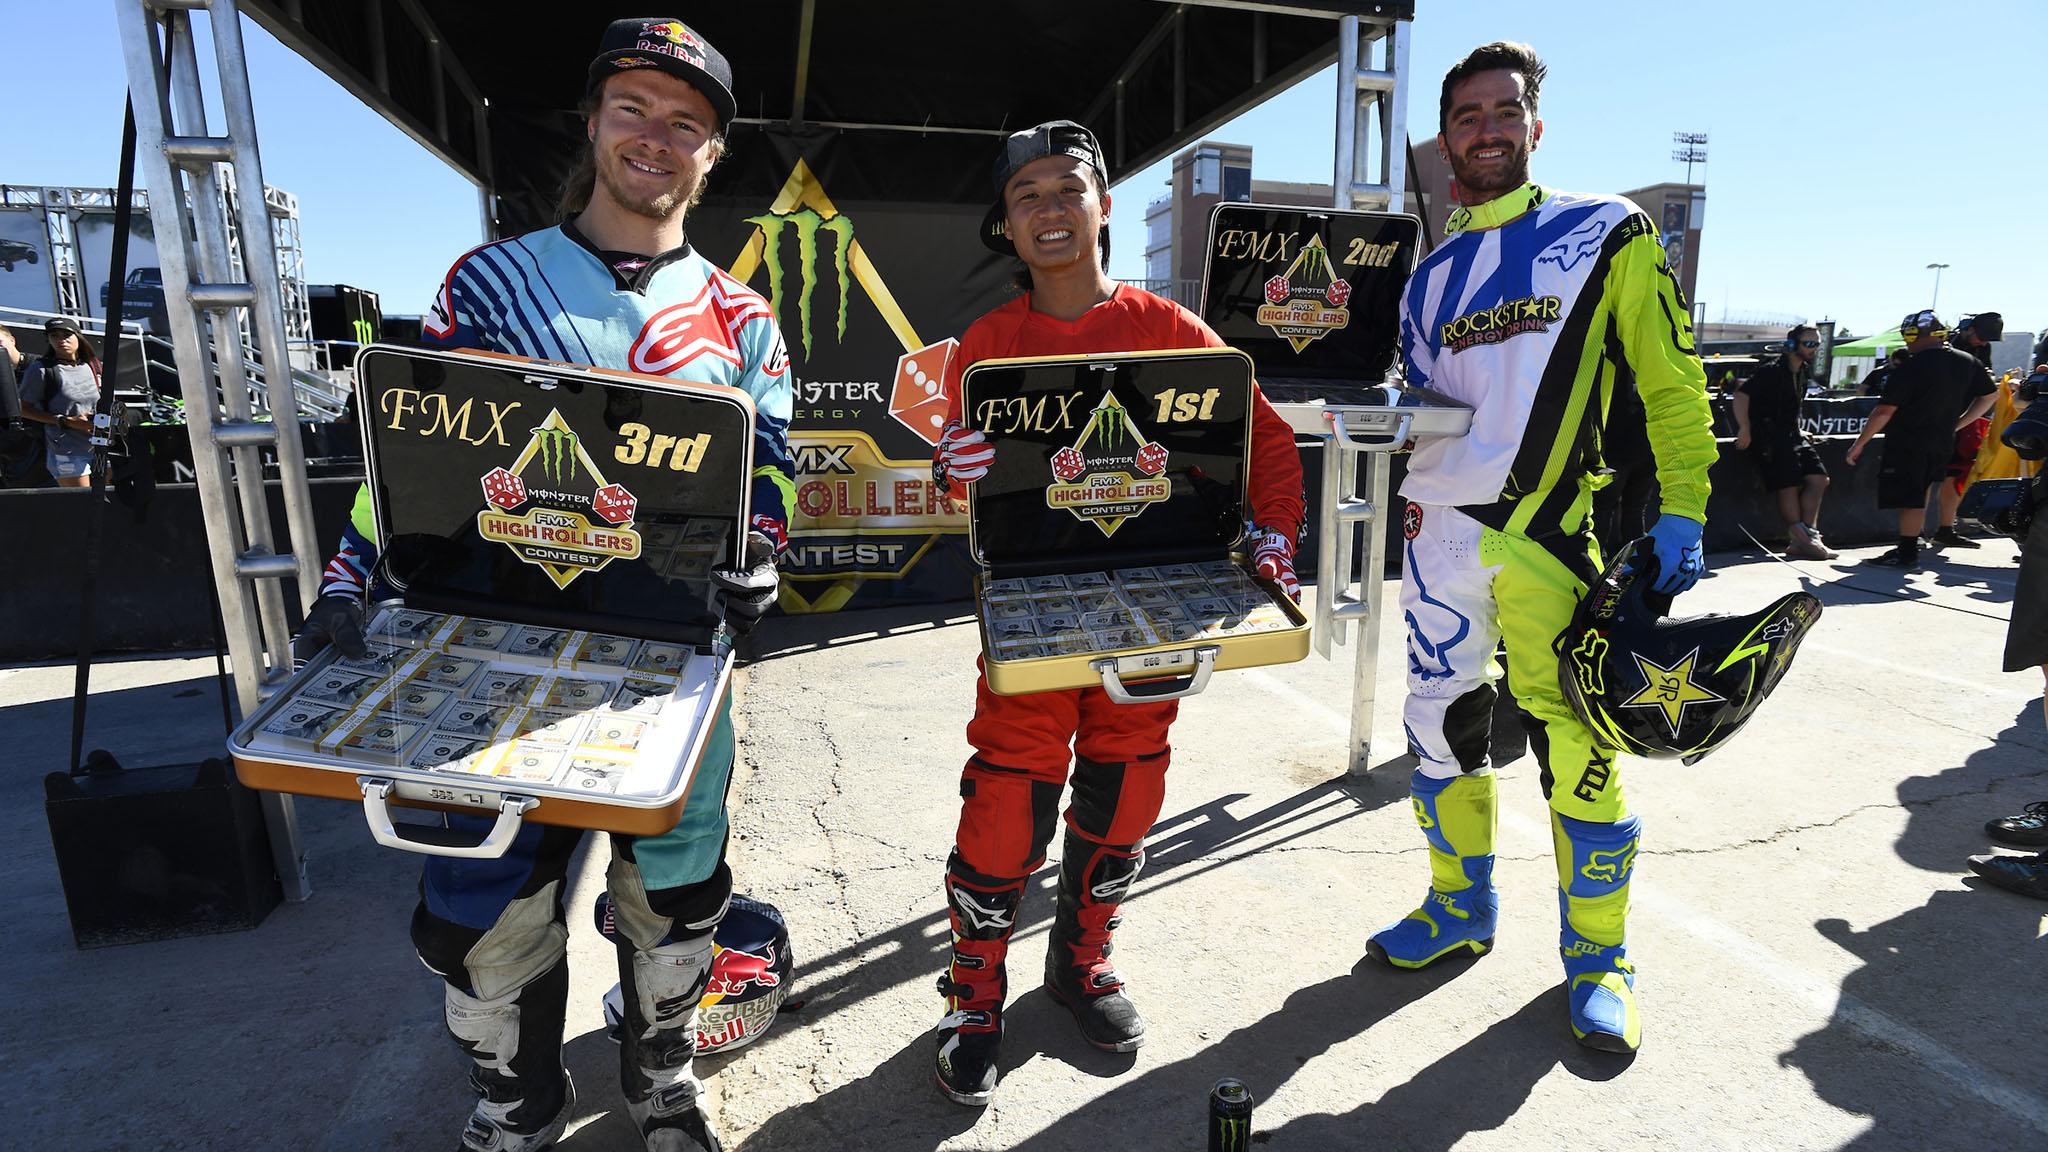 FMX podium winners